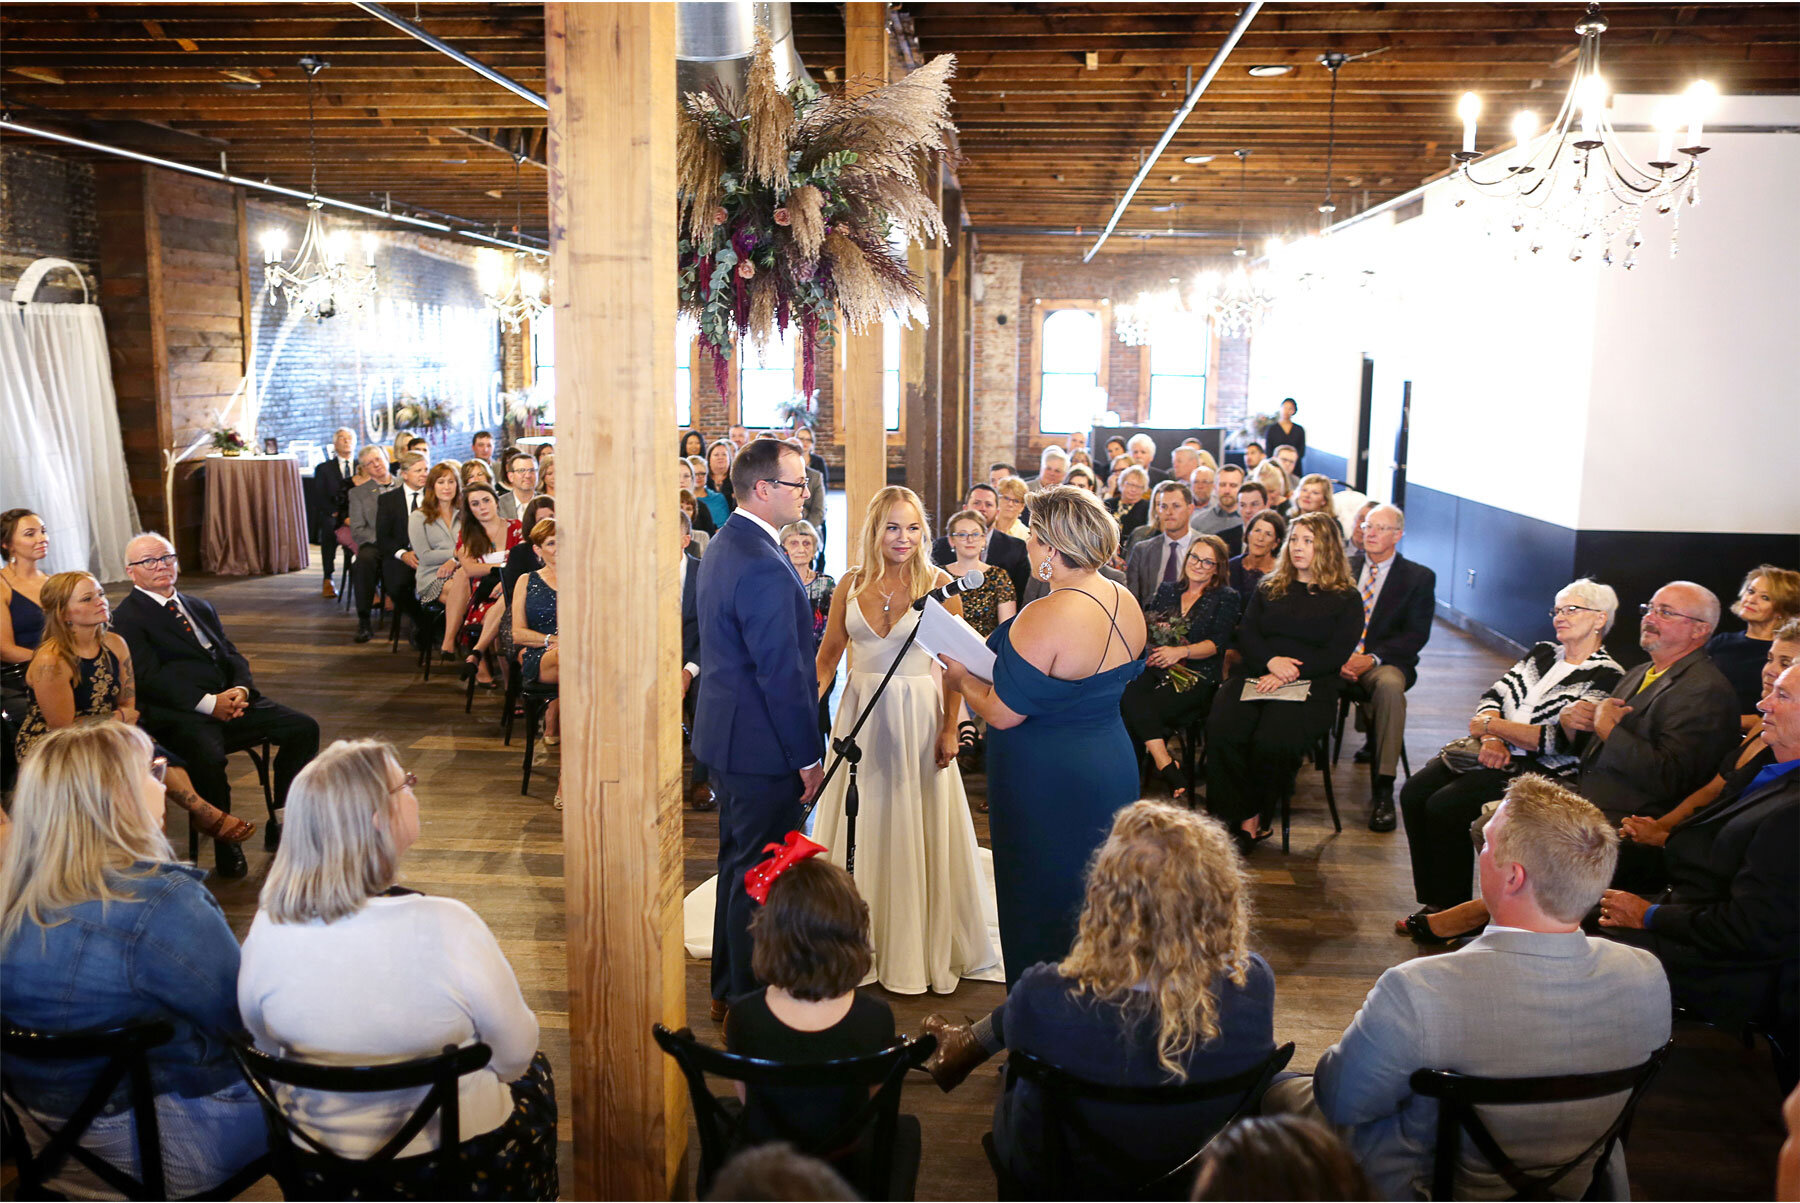 10-Vick-Photography-Wedding-Minneapolis-Minnesota-Earl-and-Wilson-Bride-Groom-Ceremony-Danielle-and-Tom.jpg